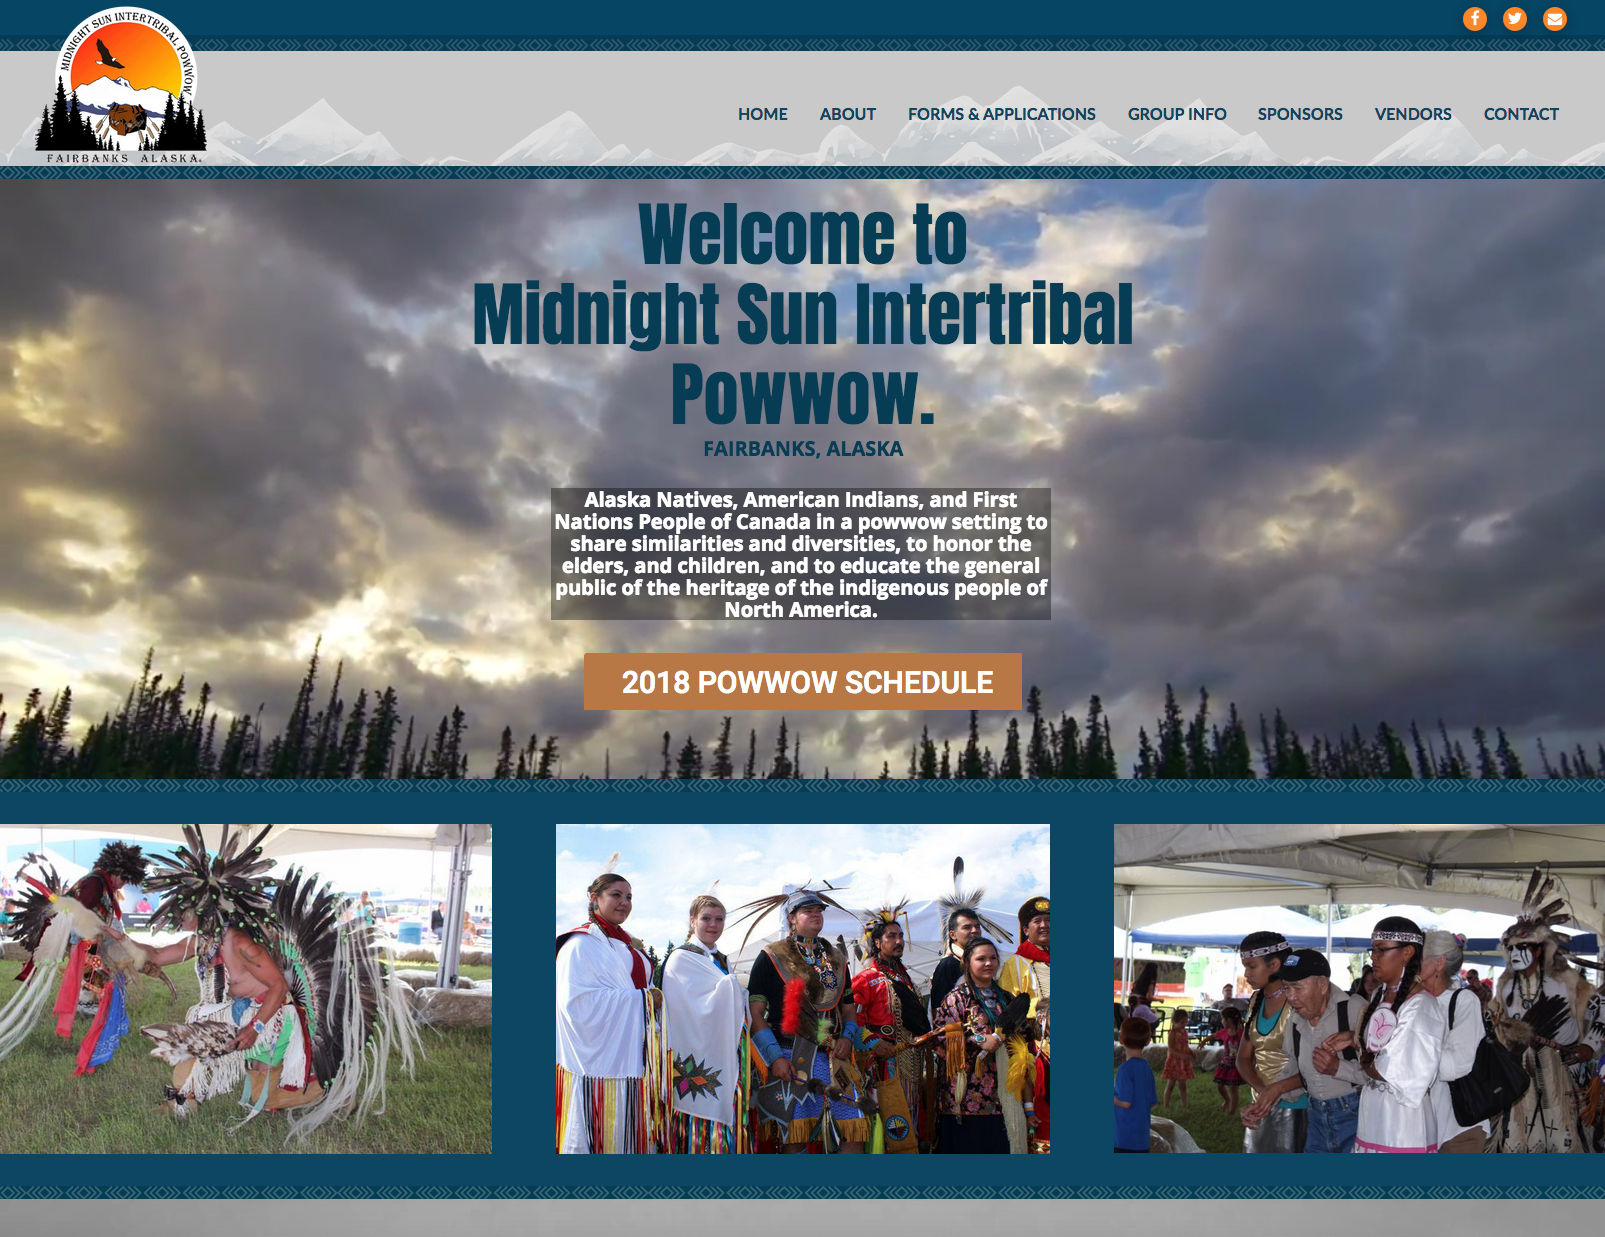 Midnight Sun Intertribal Powwow